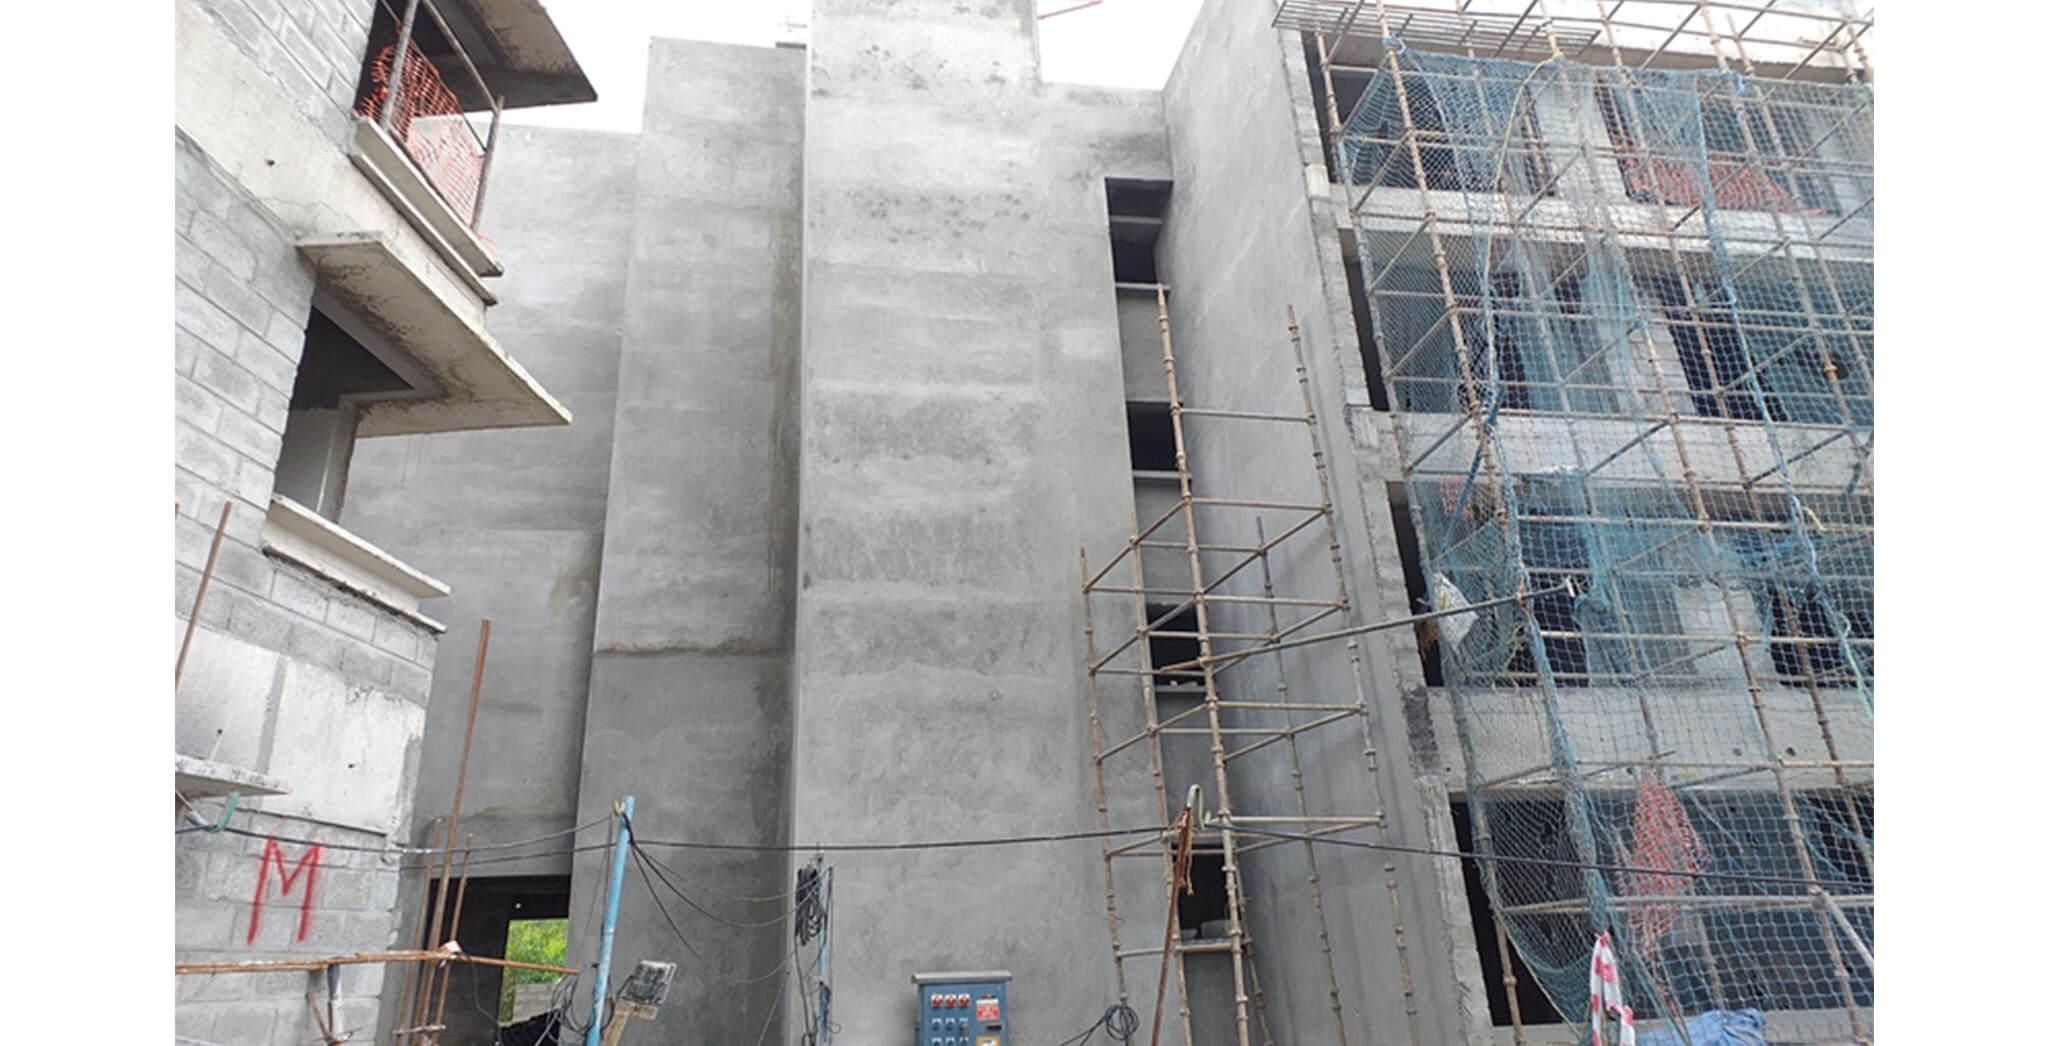 Jul 2020 - North side view: N Block—External wall plastering work-in-progress.